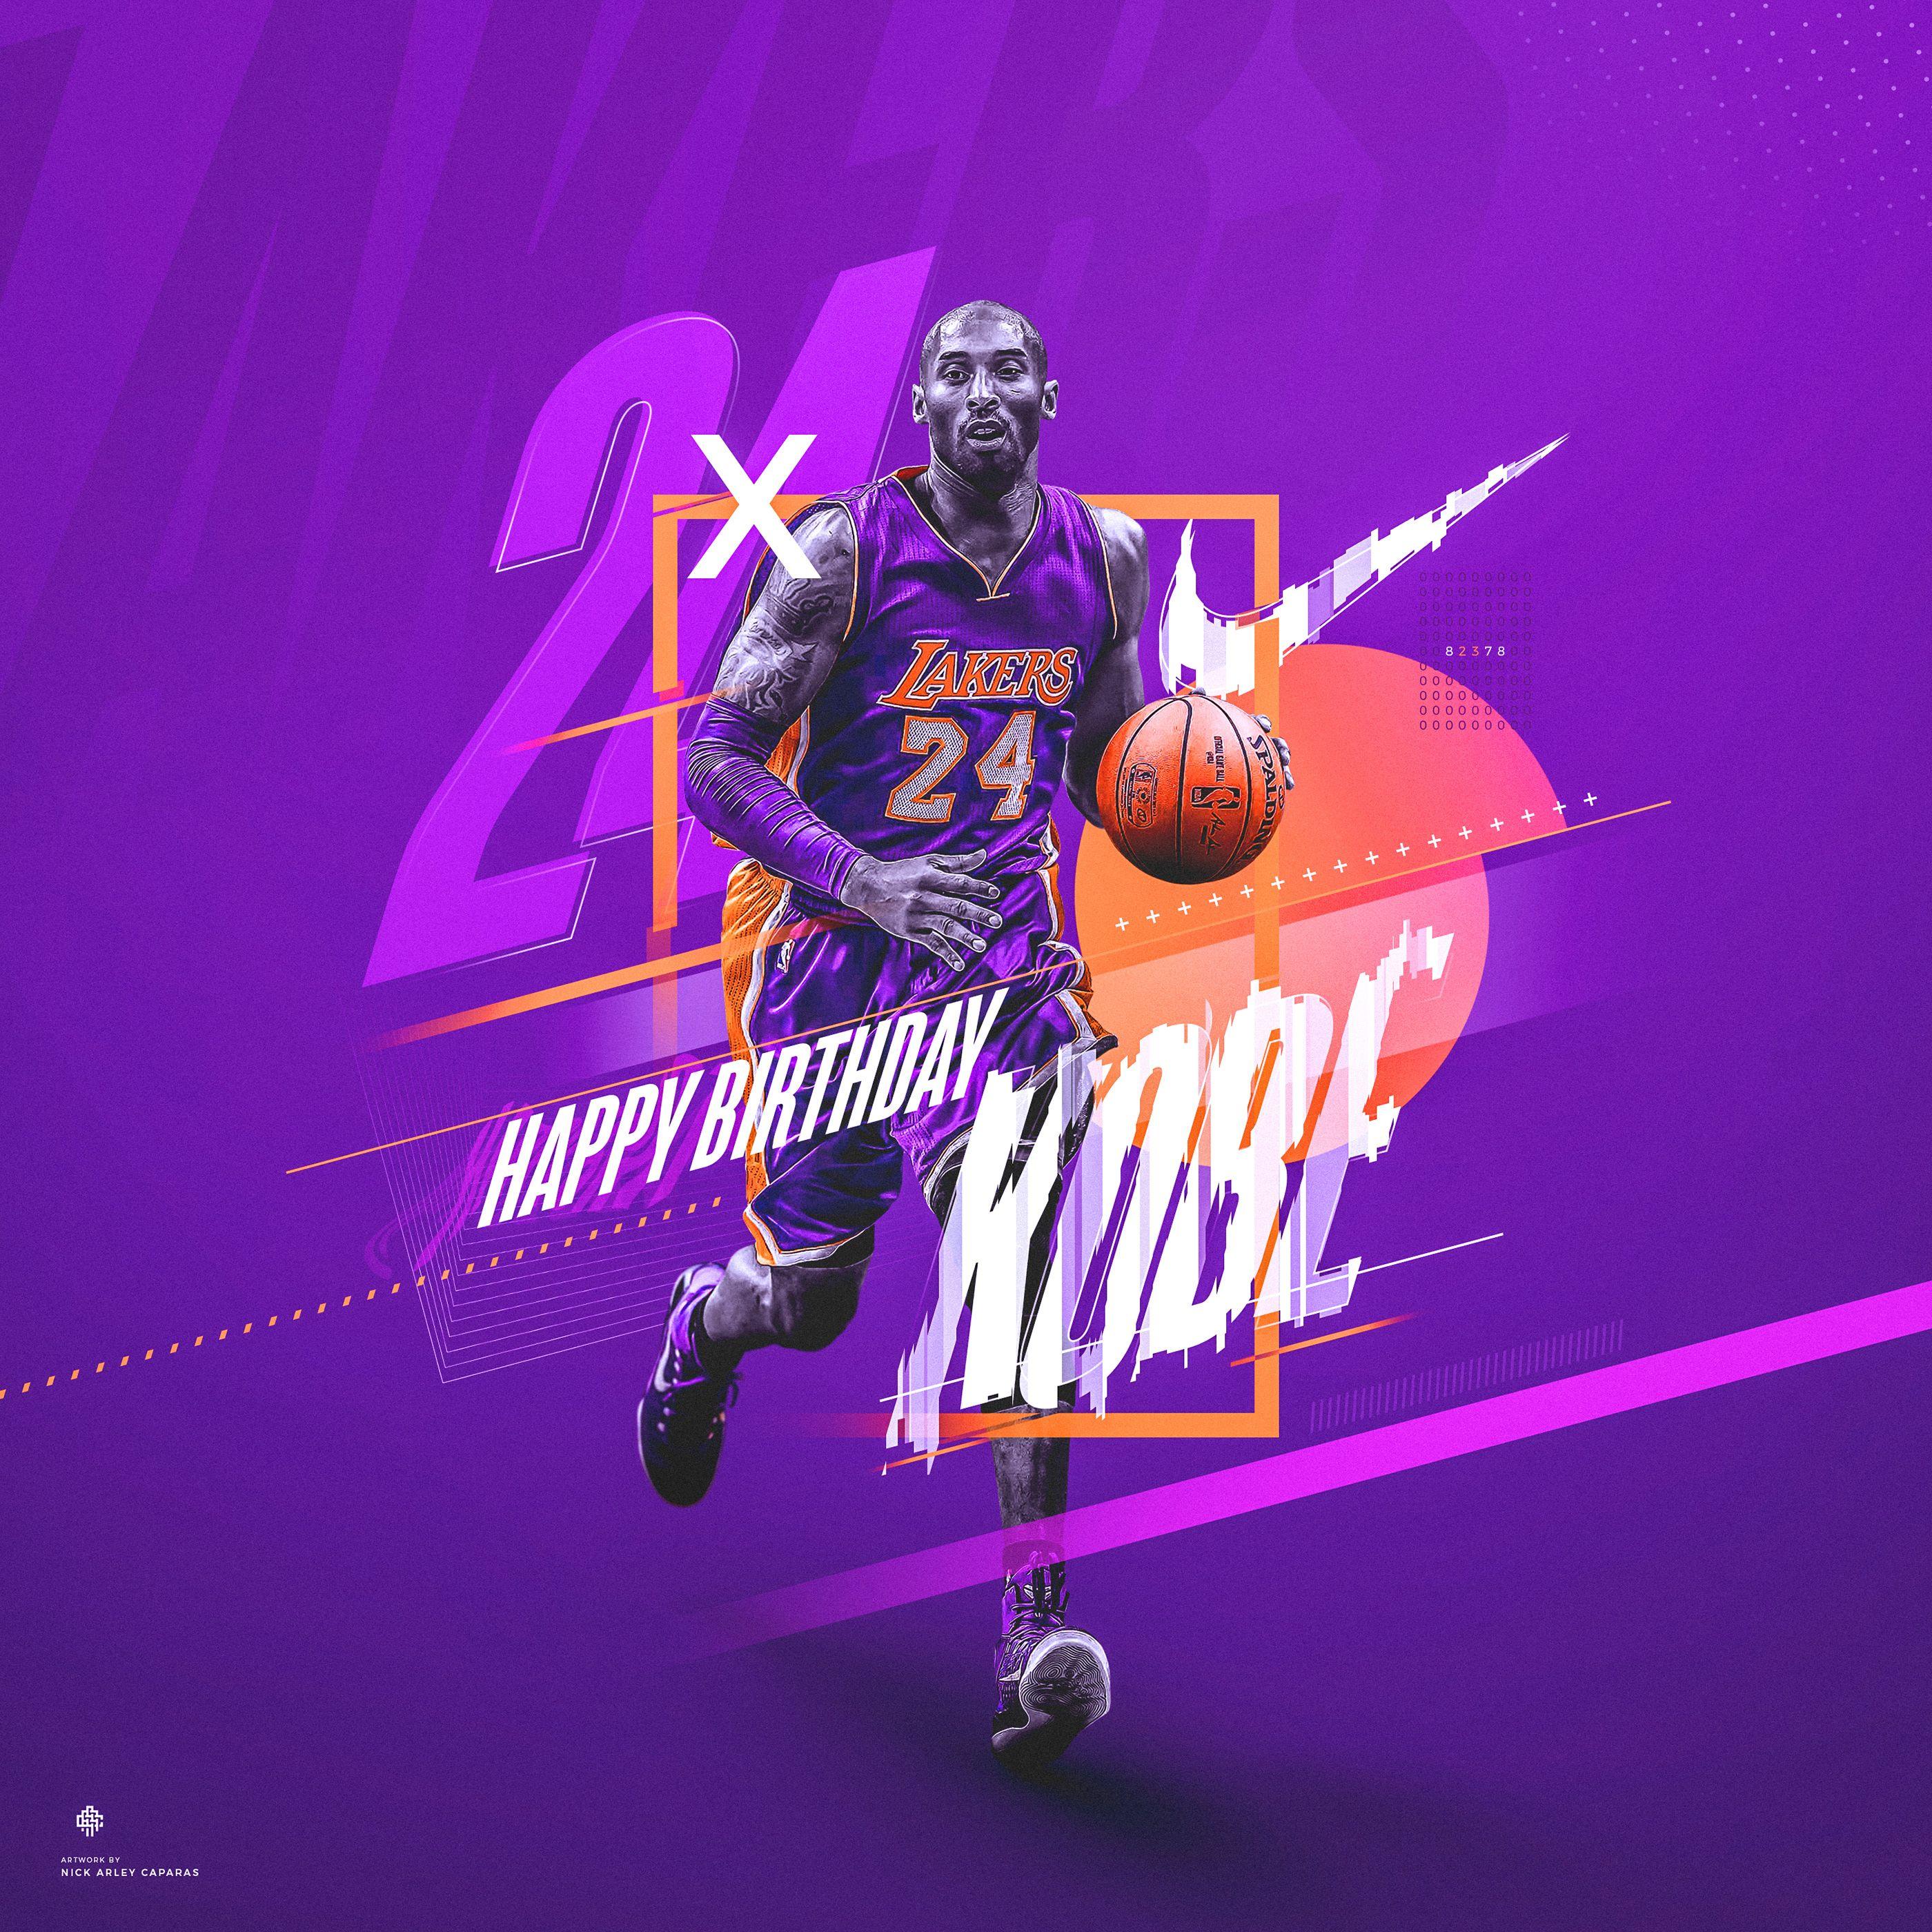 Nike (Spoof) Kobe Bryant 24 Birthday Graphic on